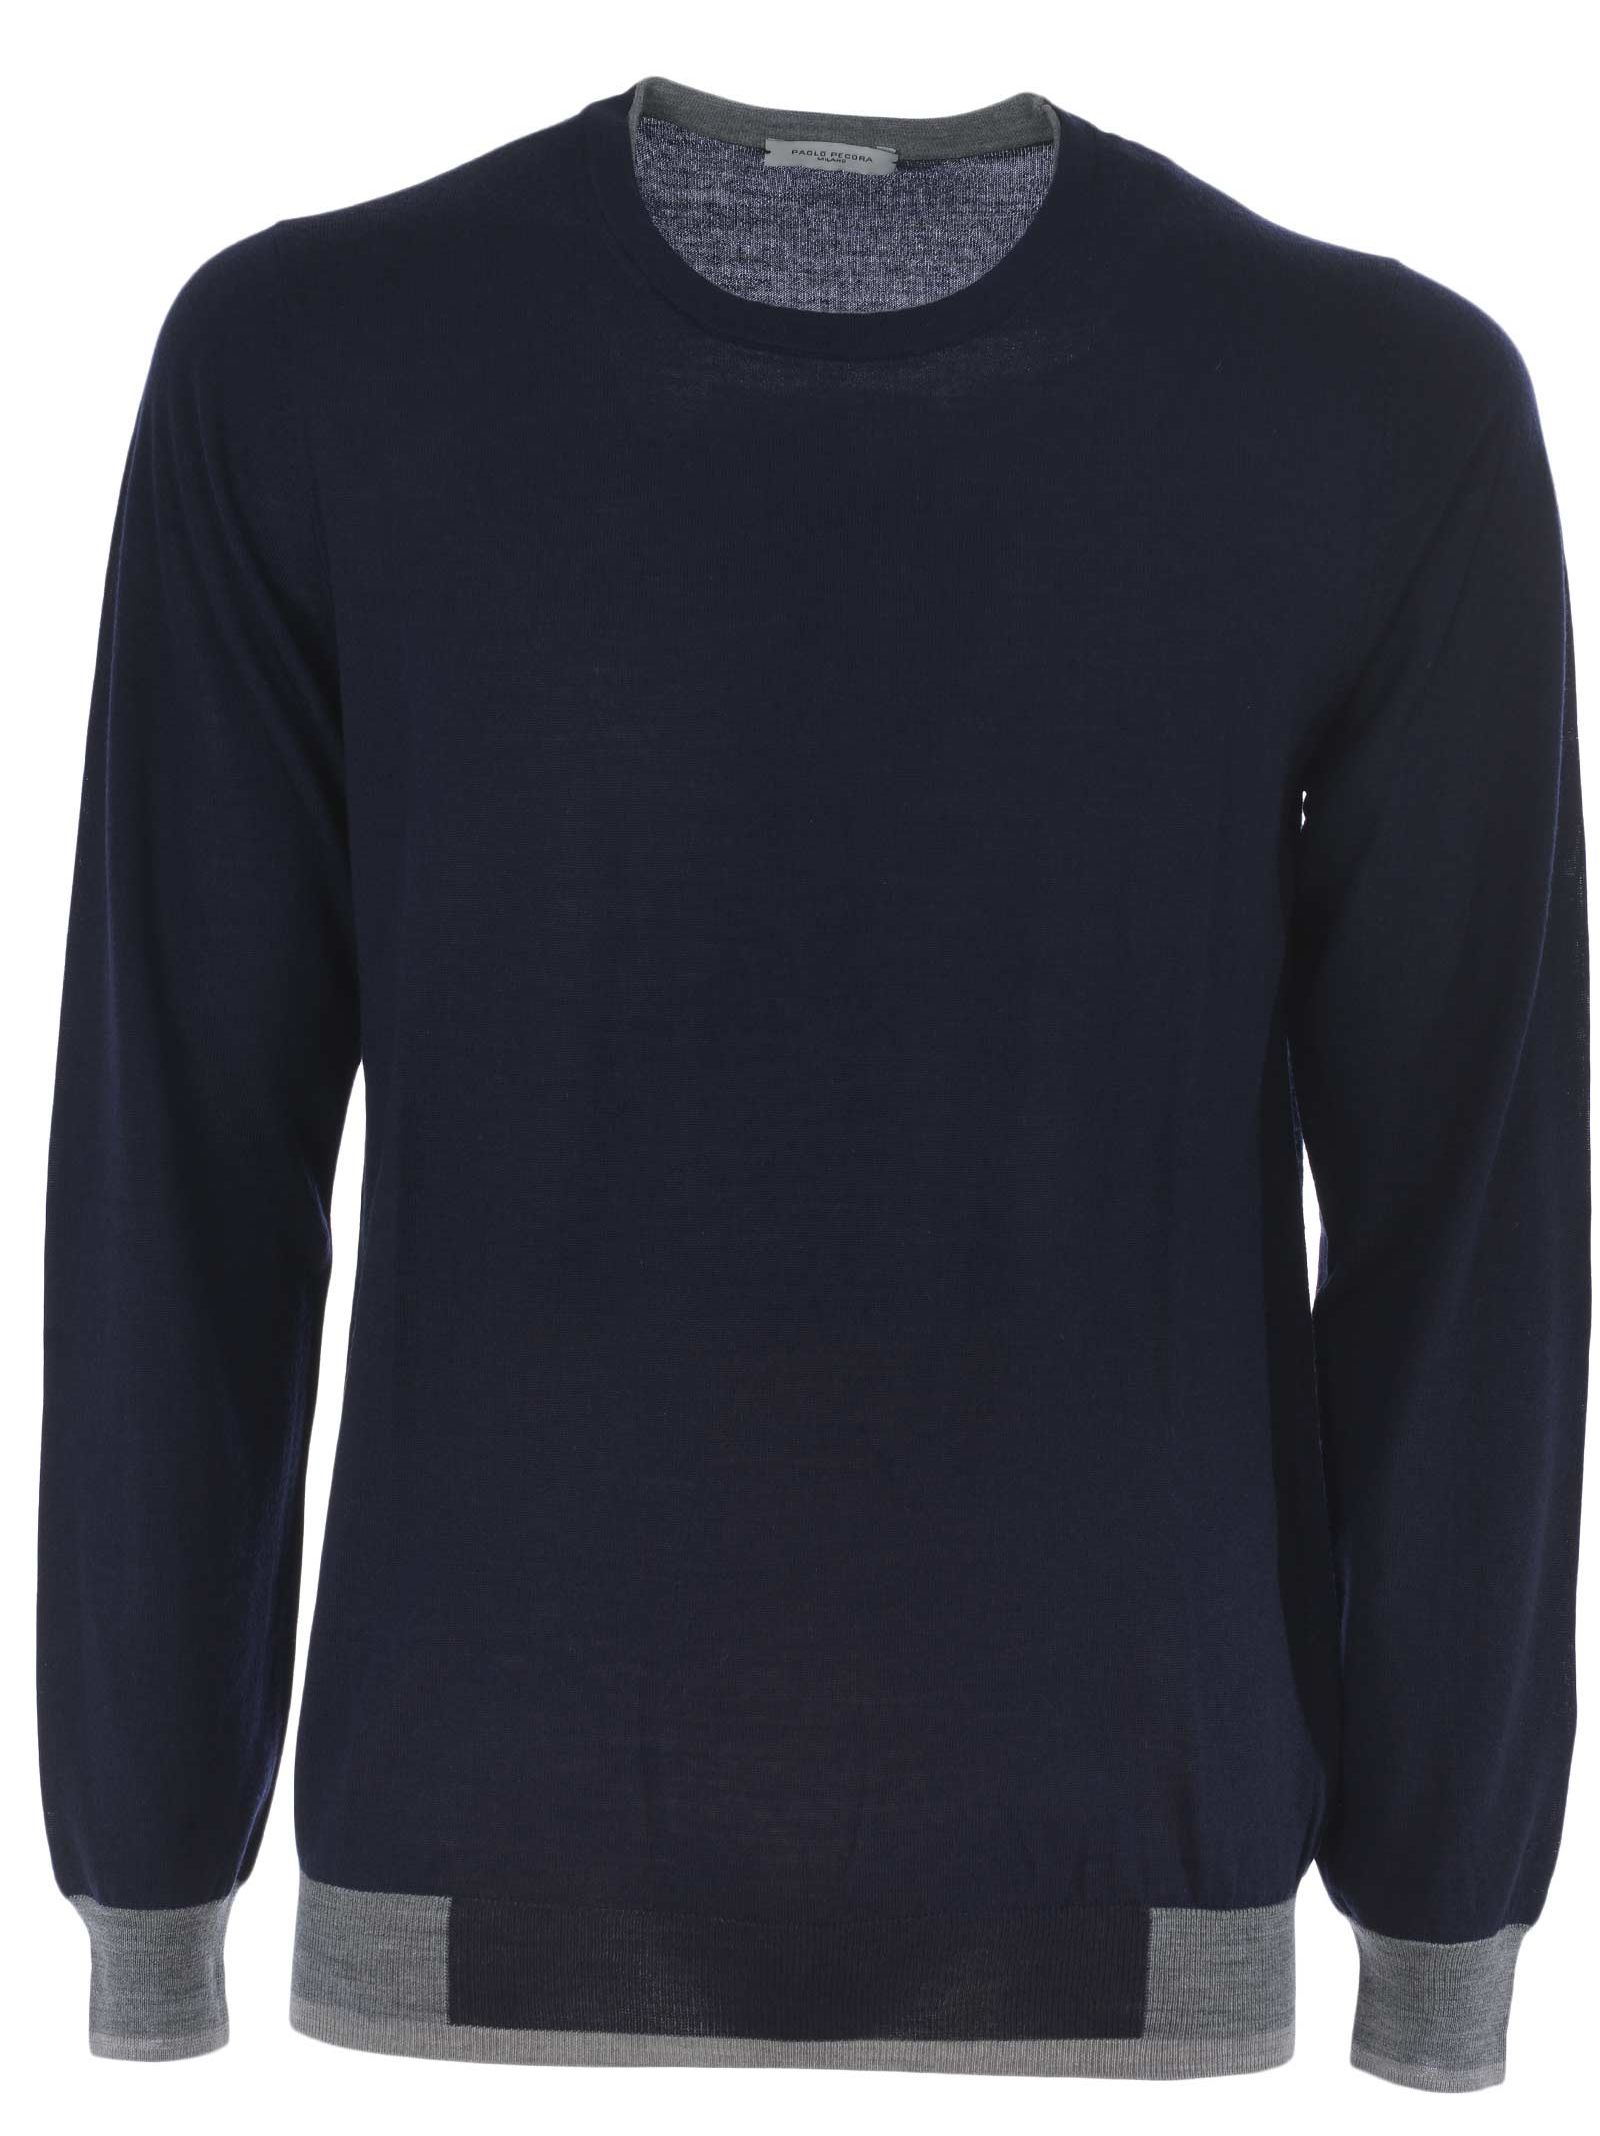 Paolo Pecora Contrast Trim Sweater